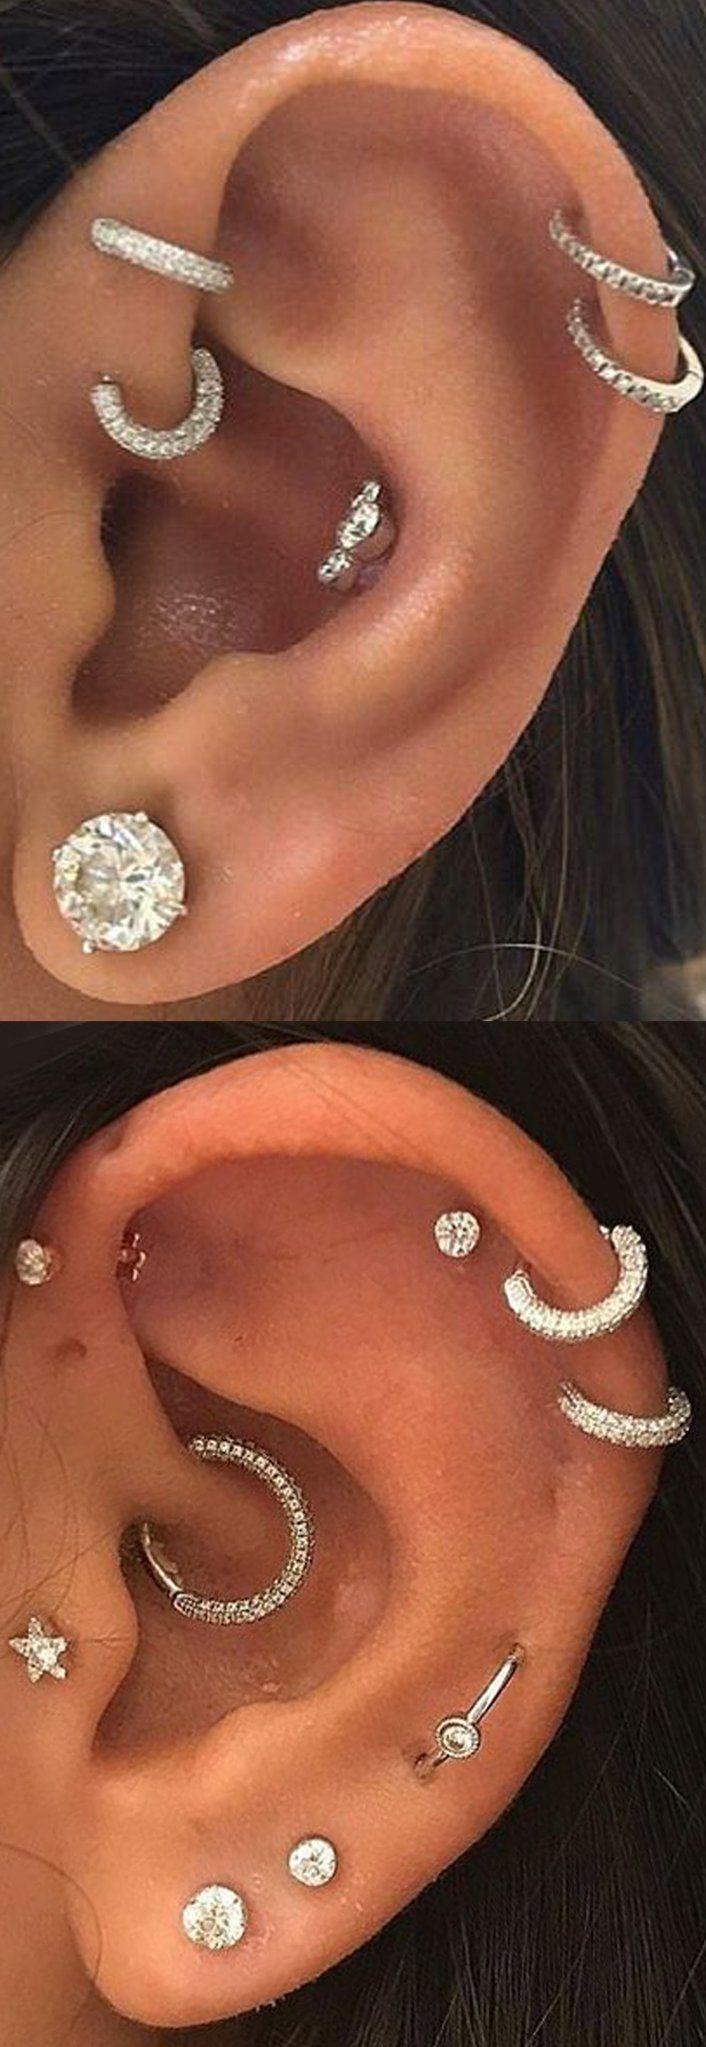 Belly button piercing scar  Industrie  Piercing   JewelryPiercings  Pinterest